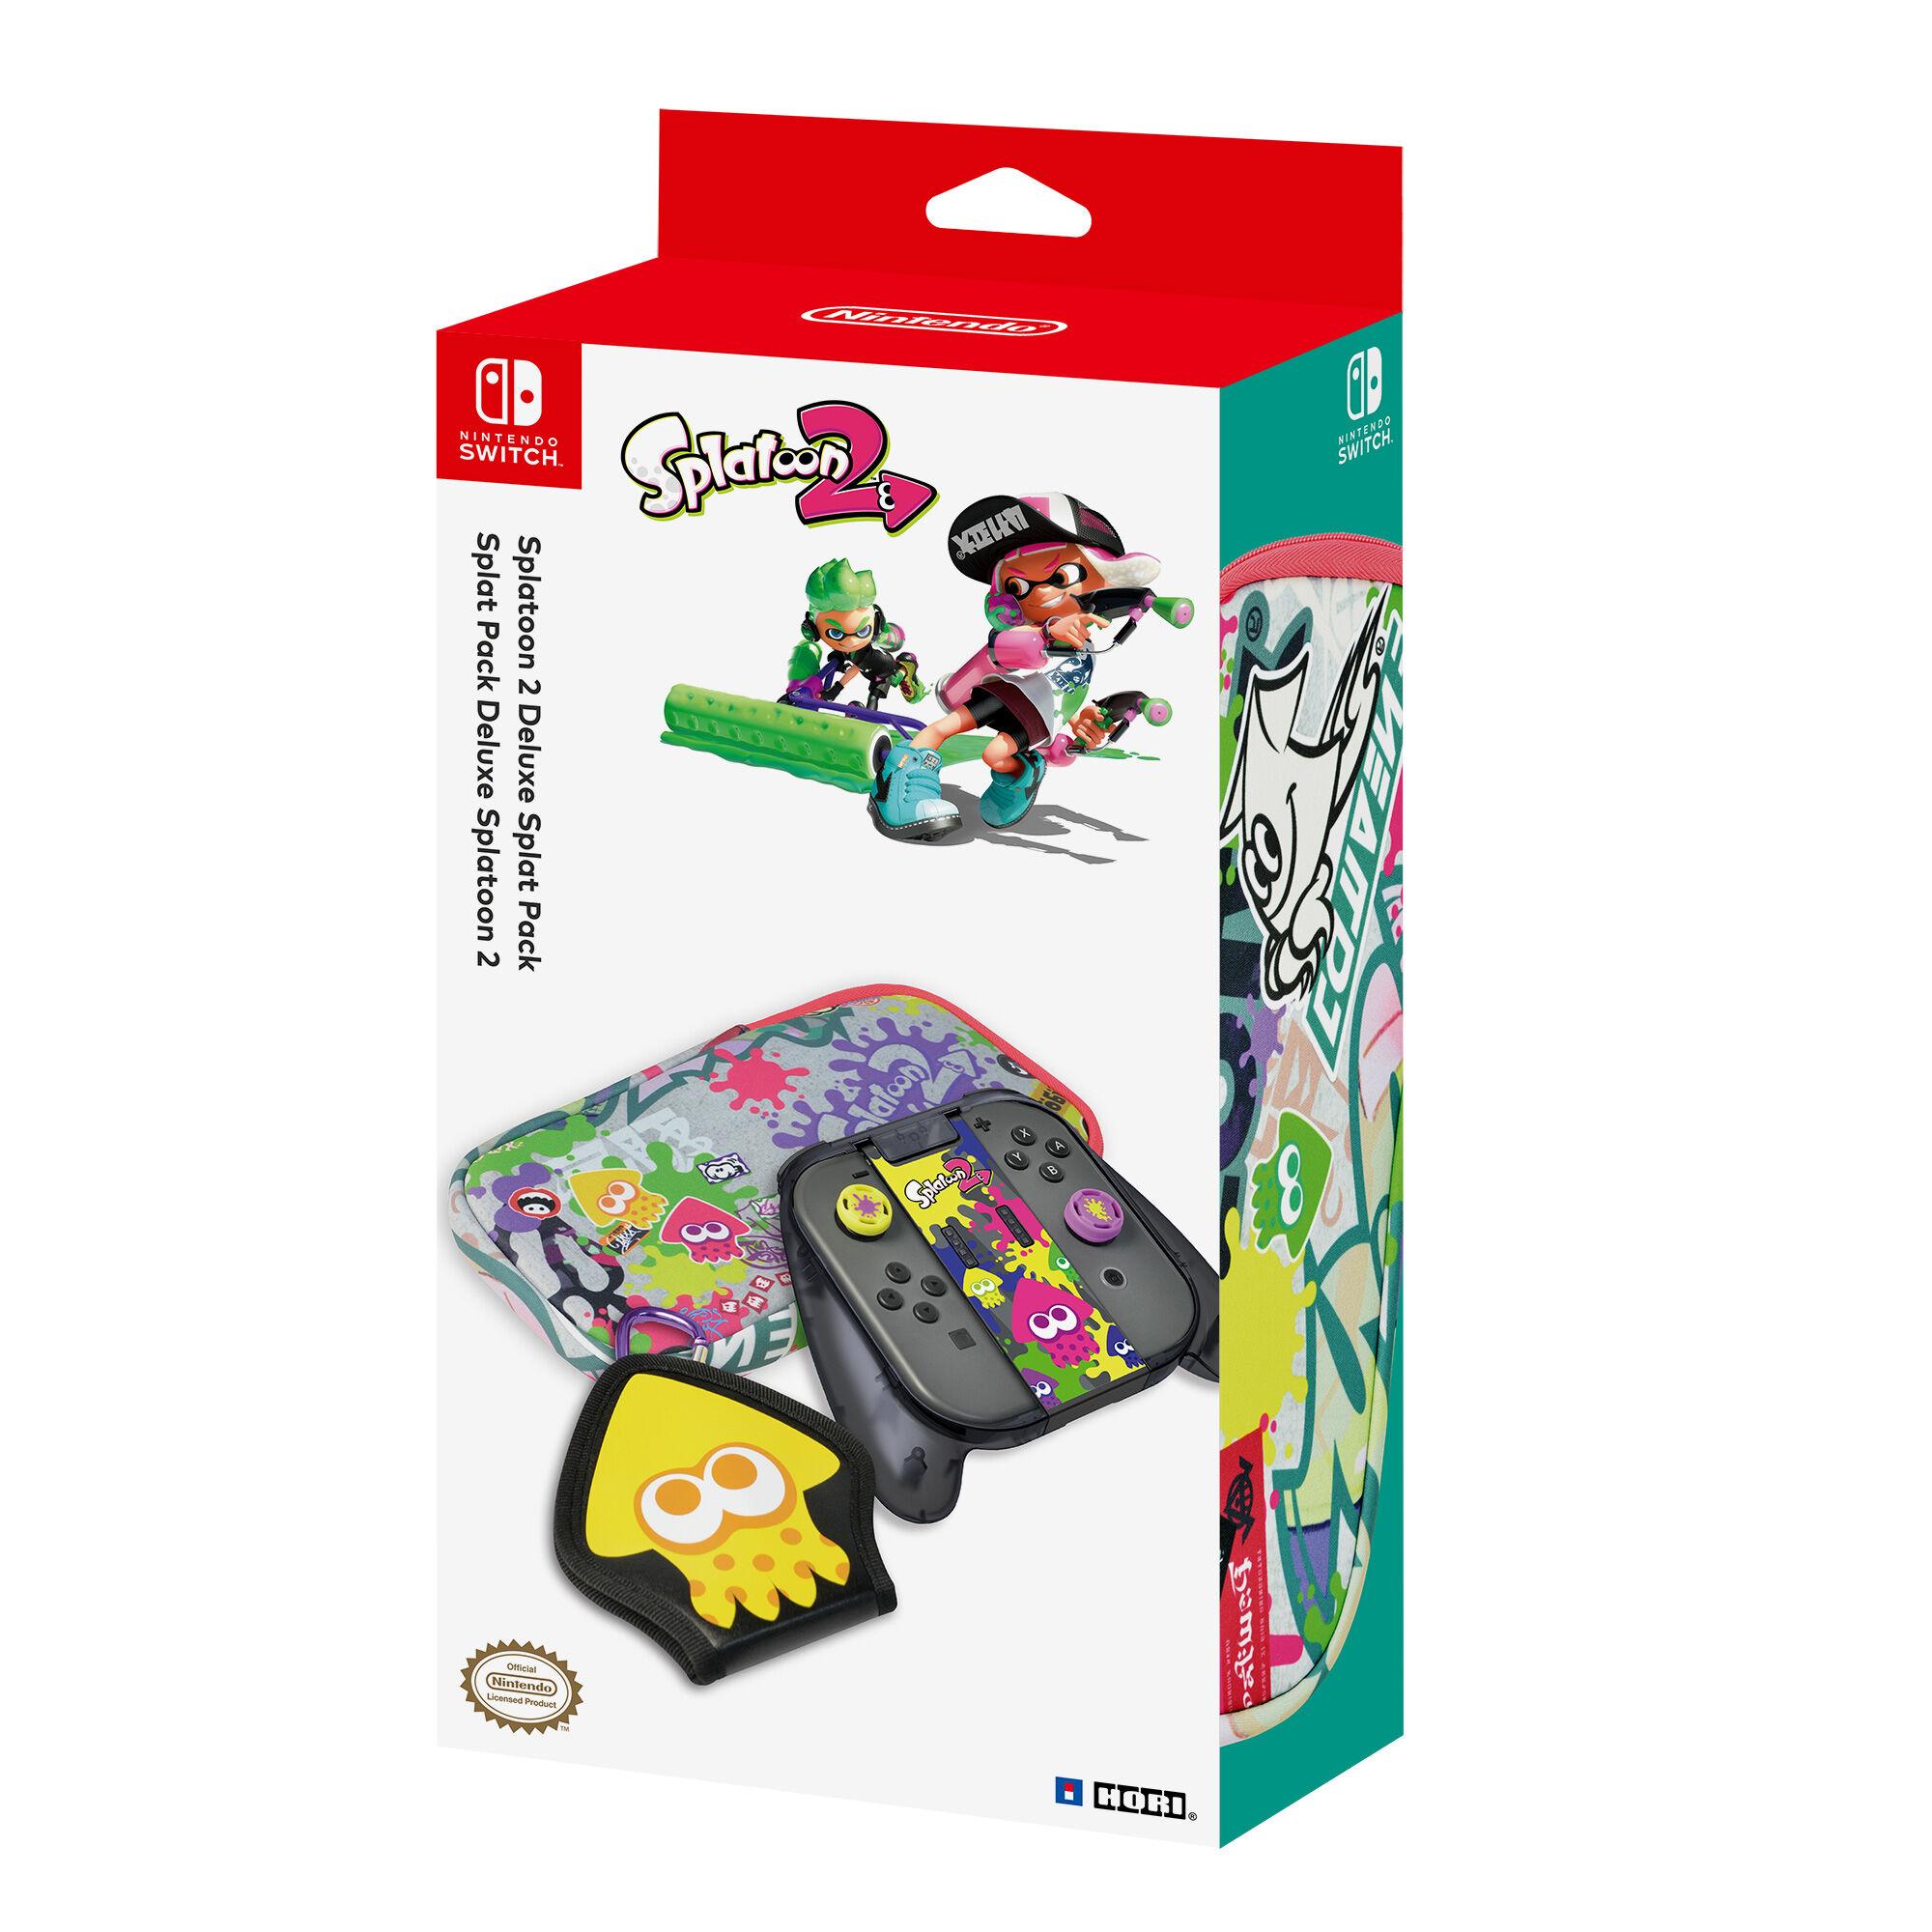 Nintendo Hori Slat Pack Deluxe Splatoon 2